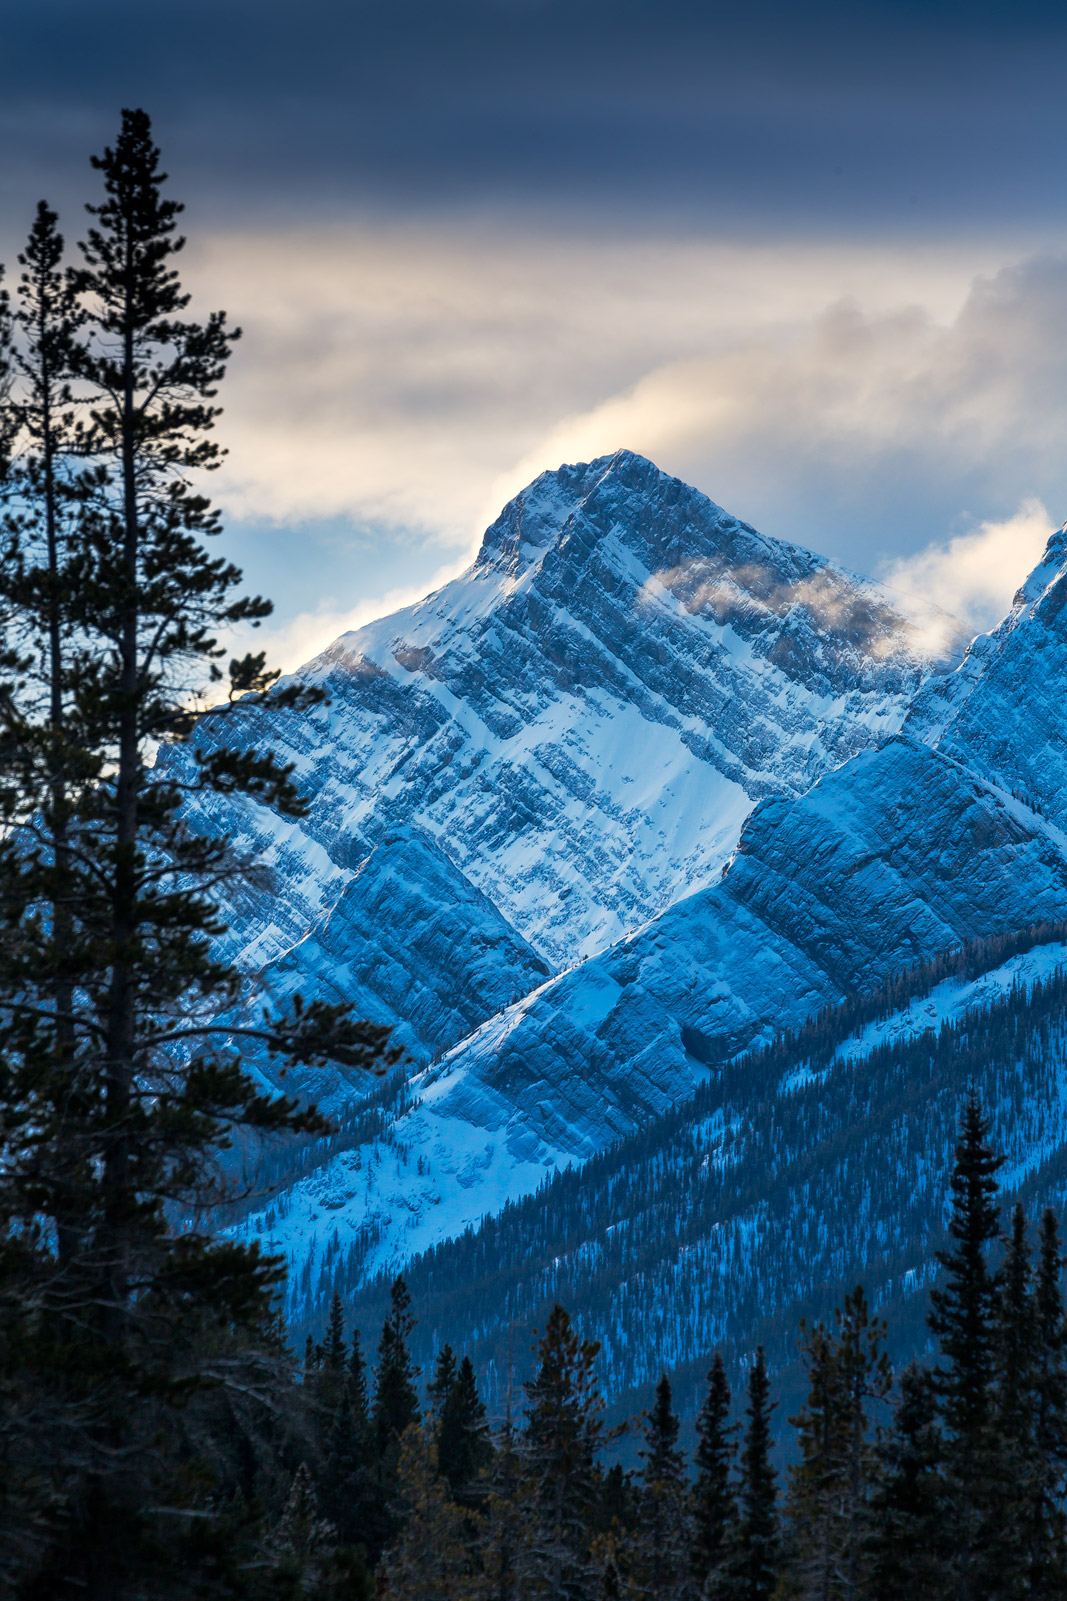 Alberta, Canada, Mountain, Winter, Wind, Snow, Canadian Rockies, Winter Scene, photo